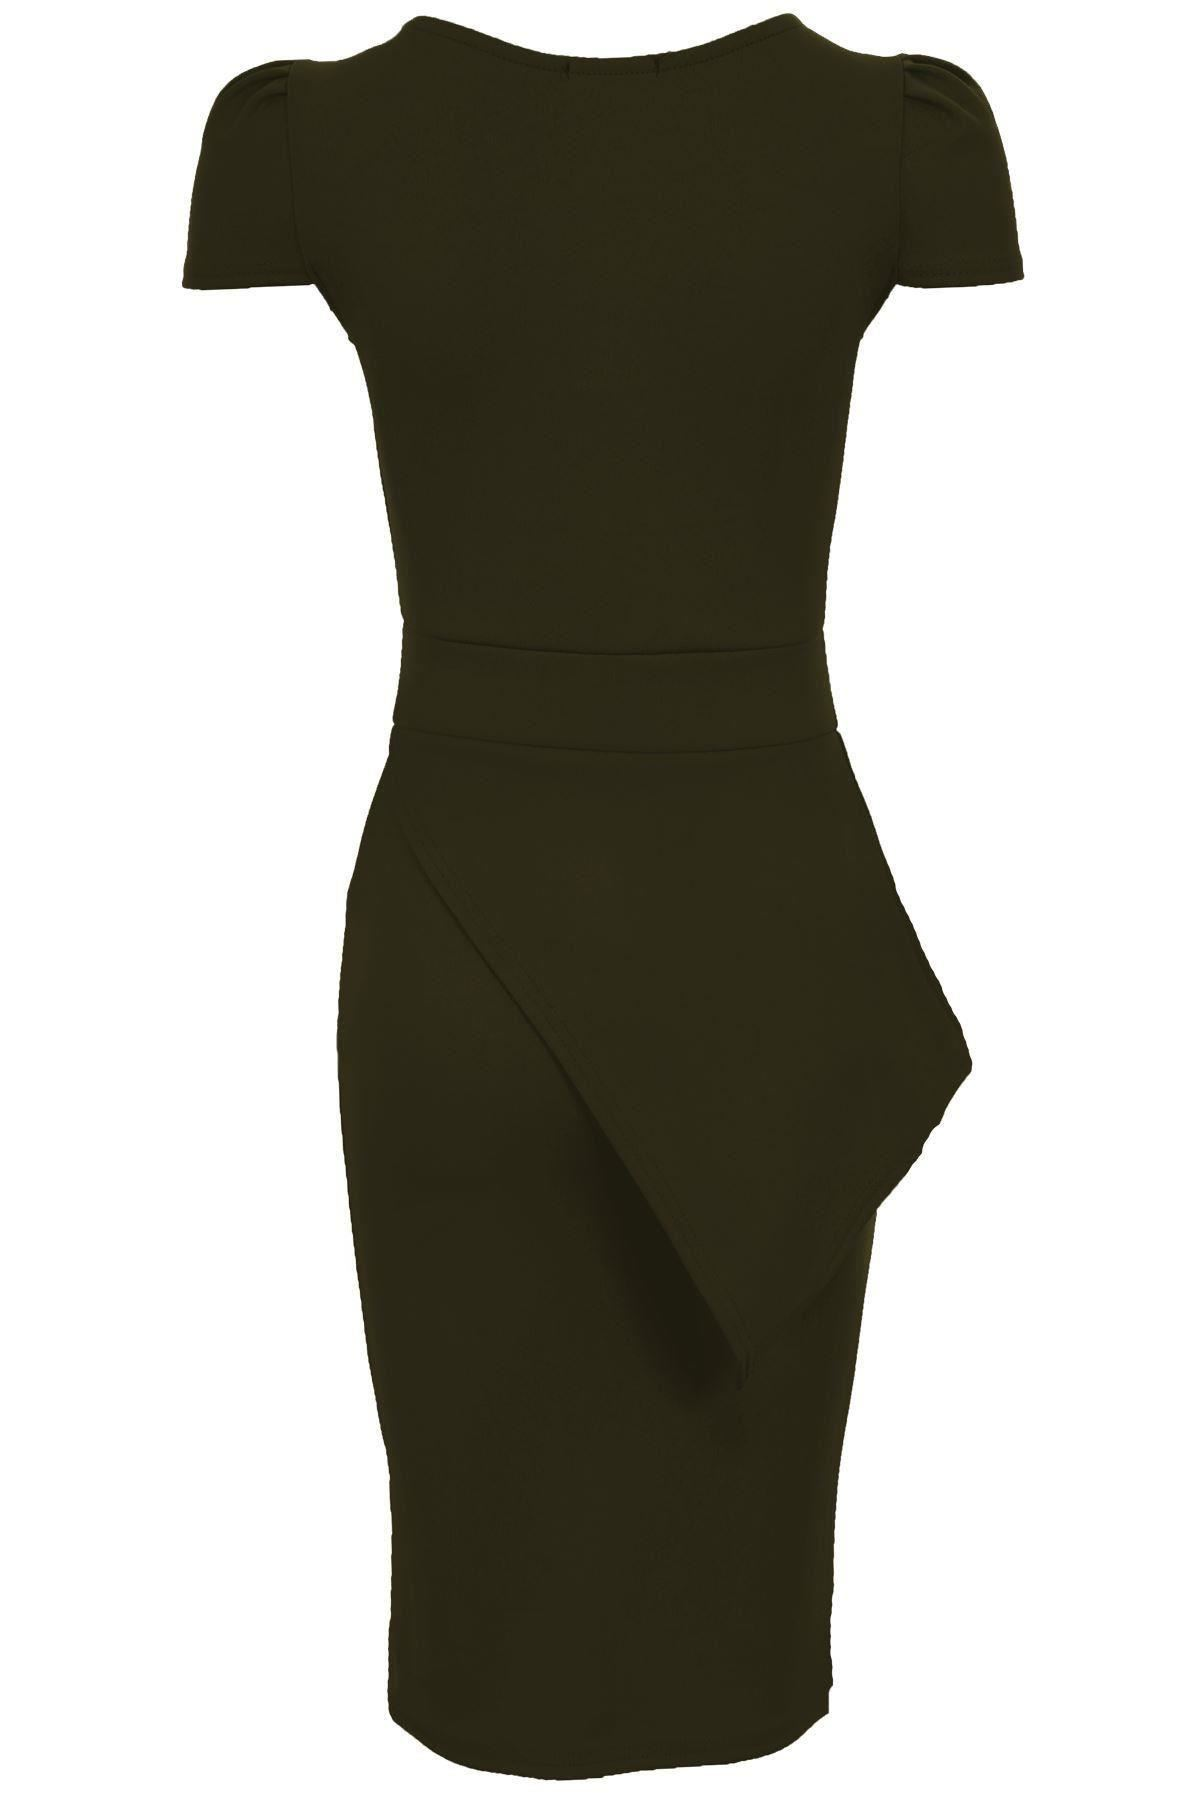 Ladies Asymmetric Neon Pencil Bodycon Knee Length Midi Womens Party Jolie Clothing Georgia Mini Dress Tube Ebay